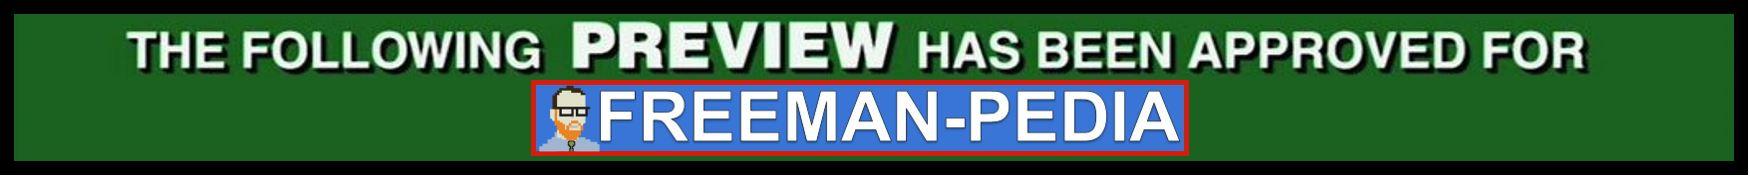 clip trailer freemanpedia banner 2019.JPG